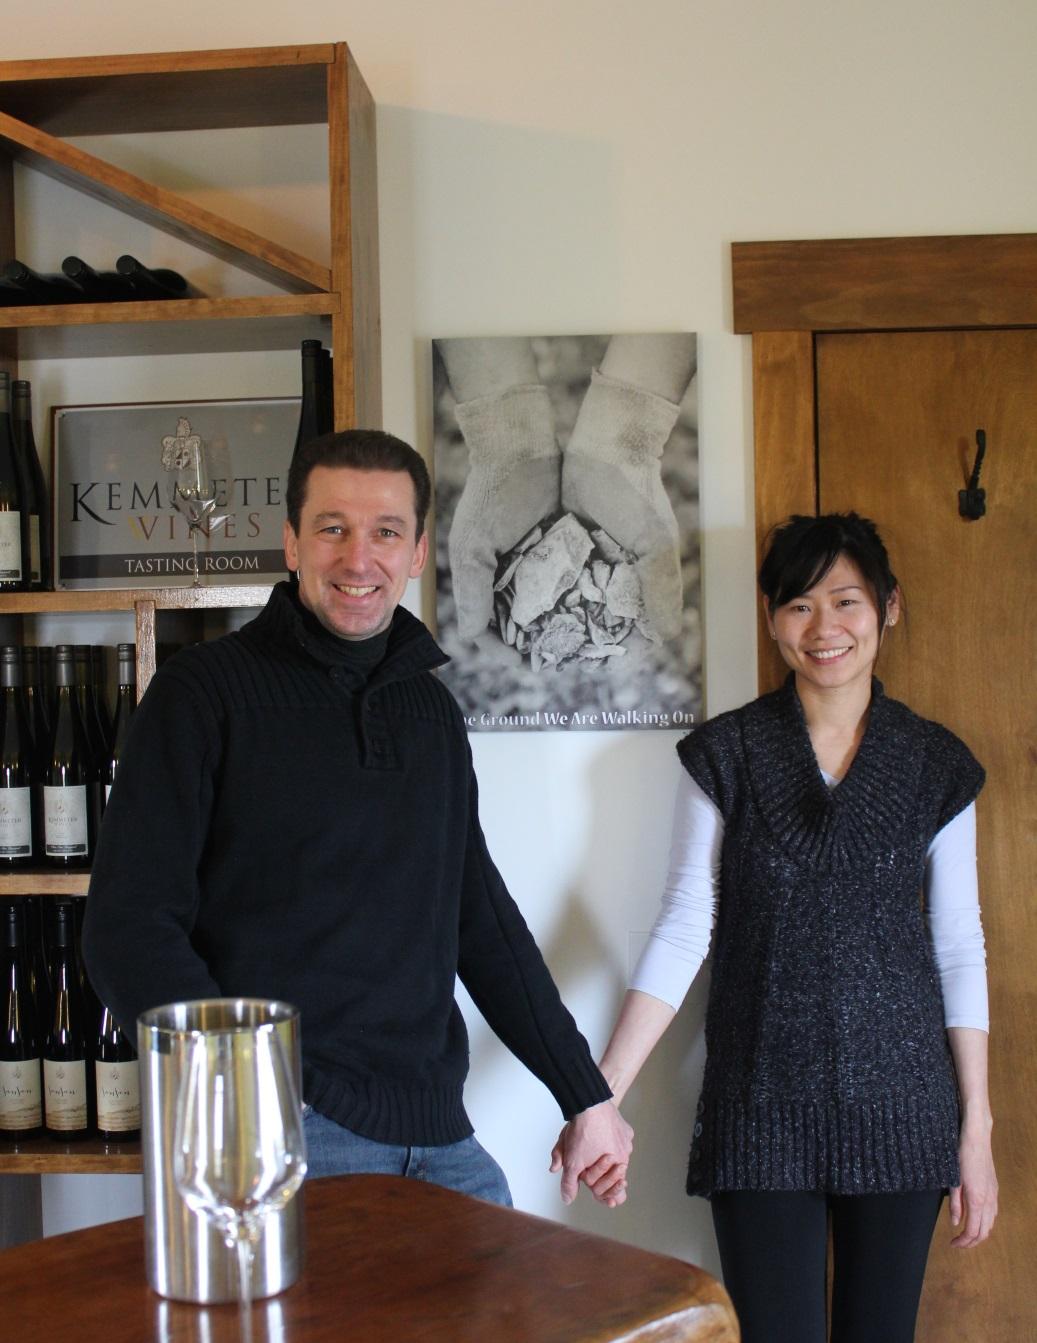 Johannes and Imelda Reinhardt